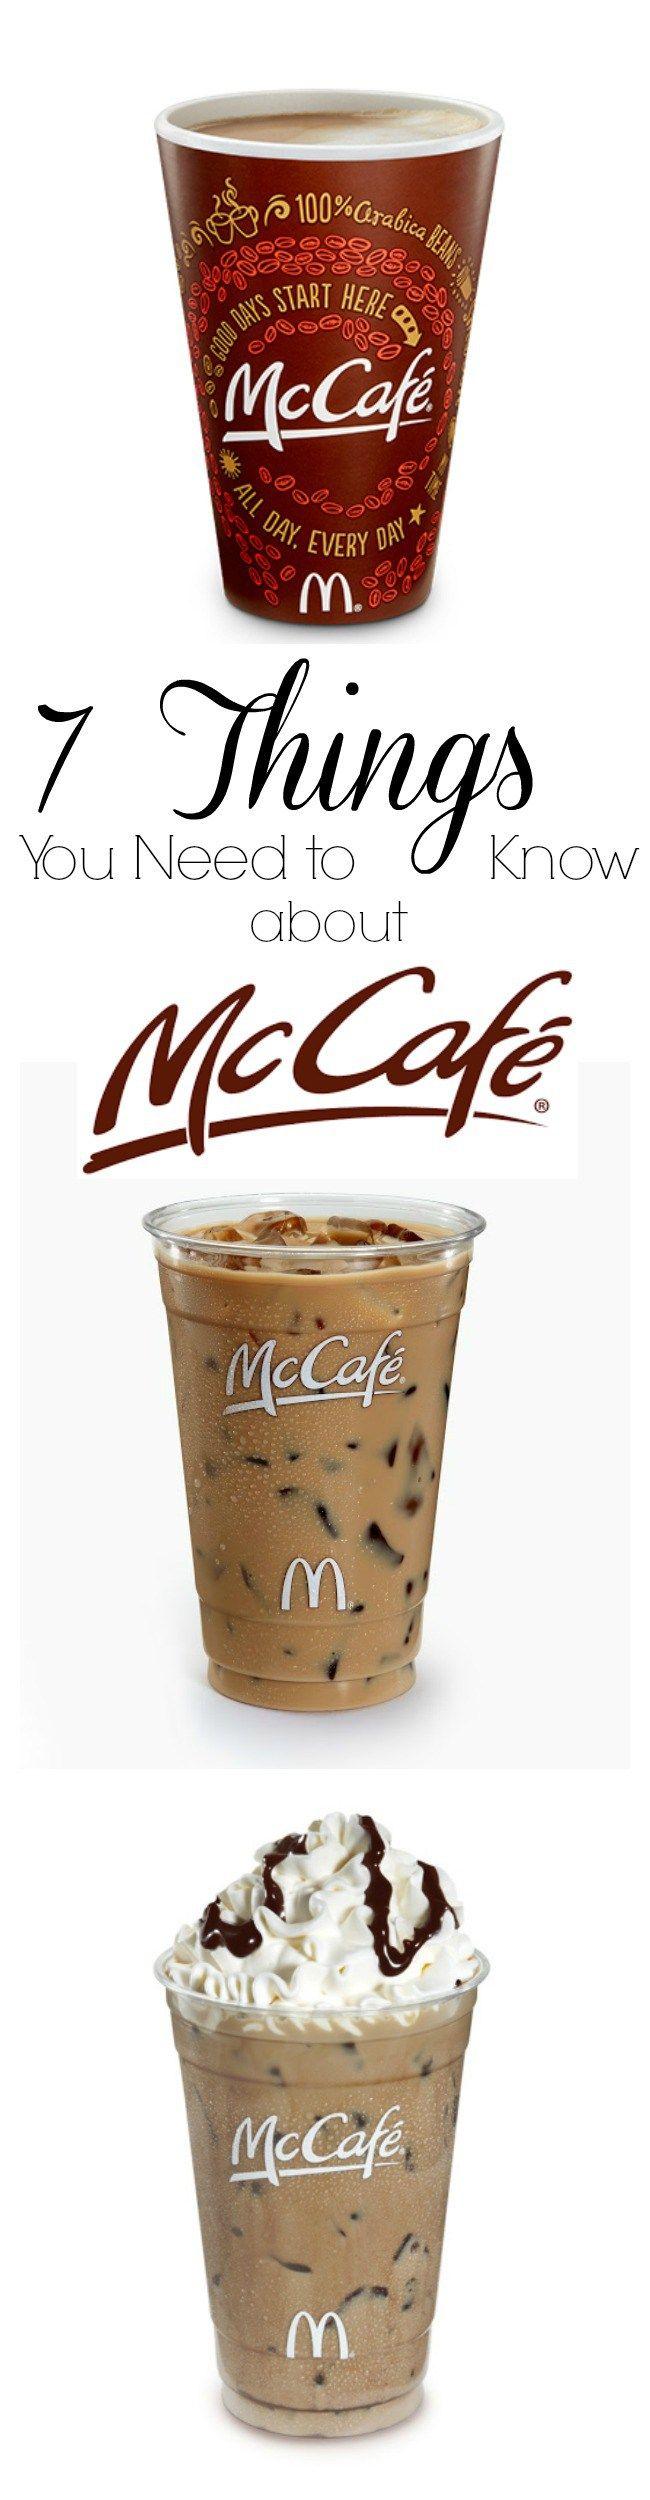 mcCafe McDonald's Coffee